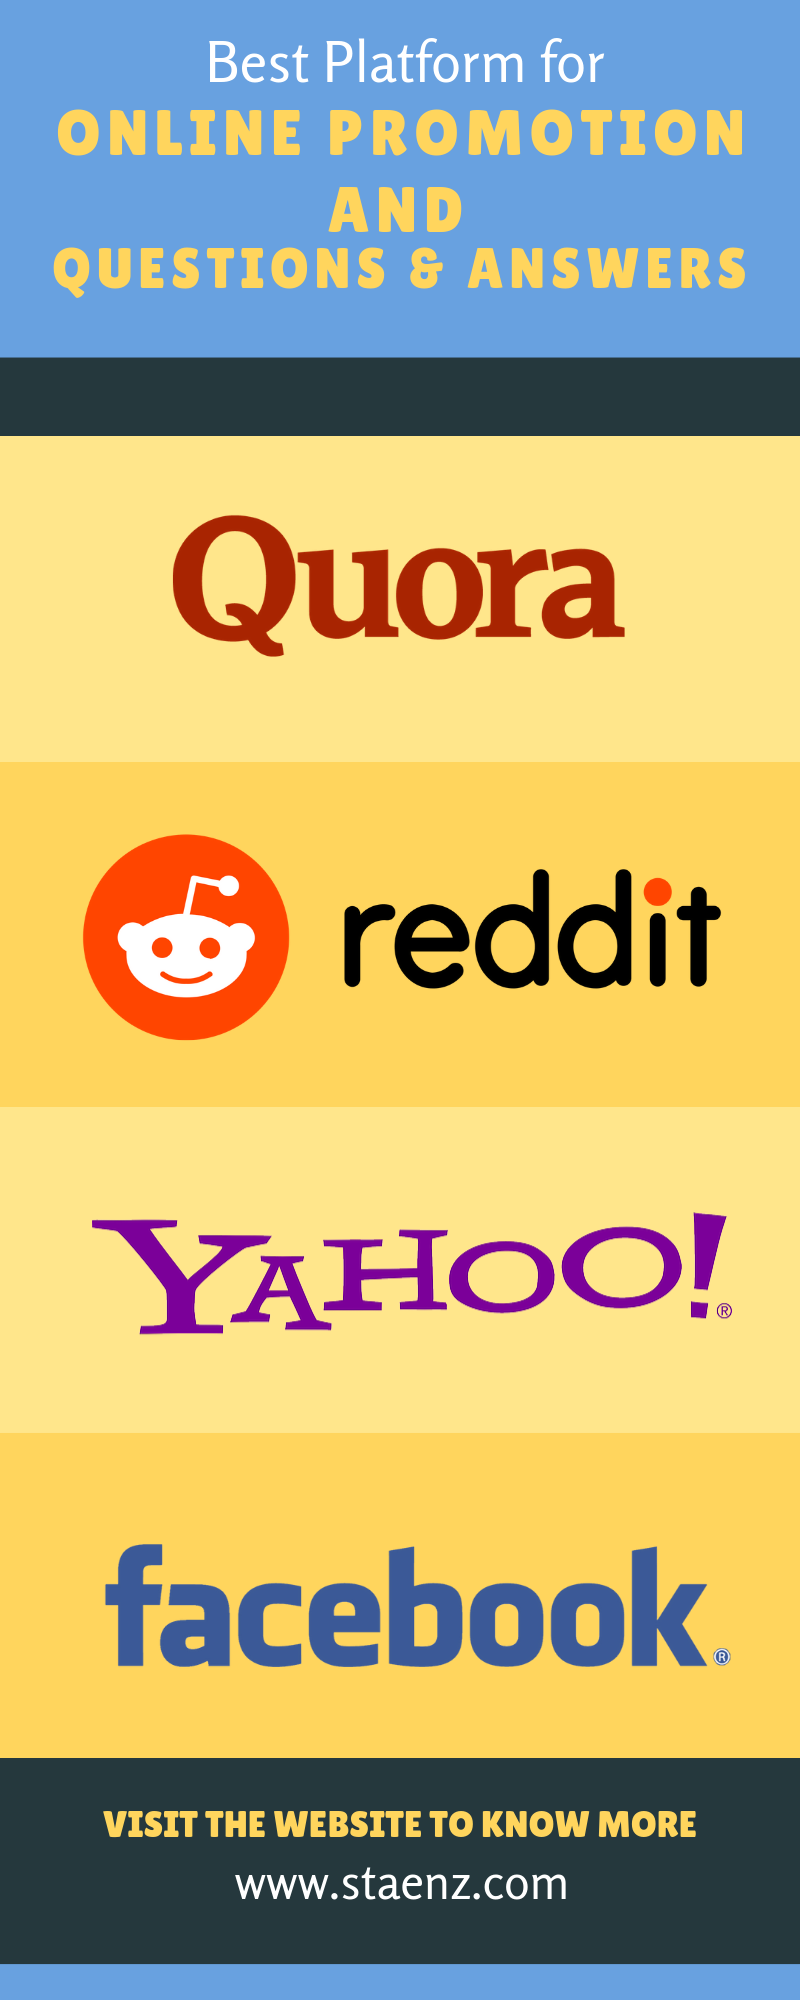 Quora vs Reddit vs Yahoo Answers vs Facebook for Online